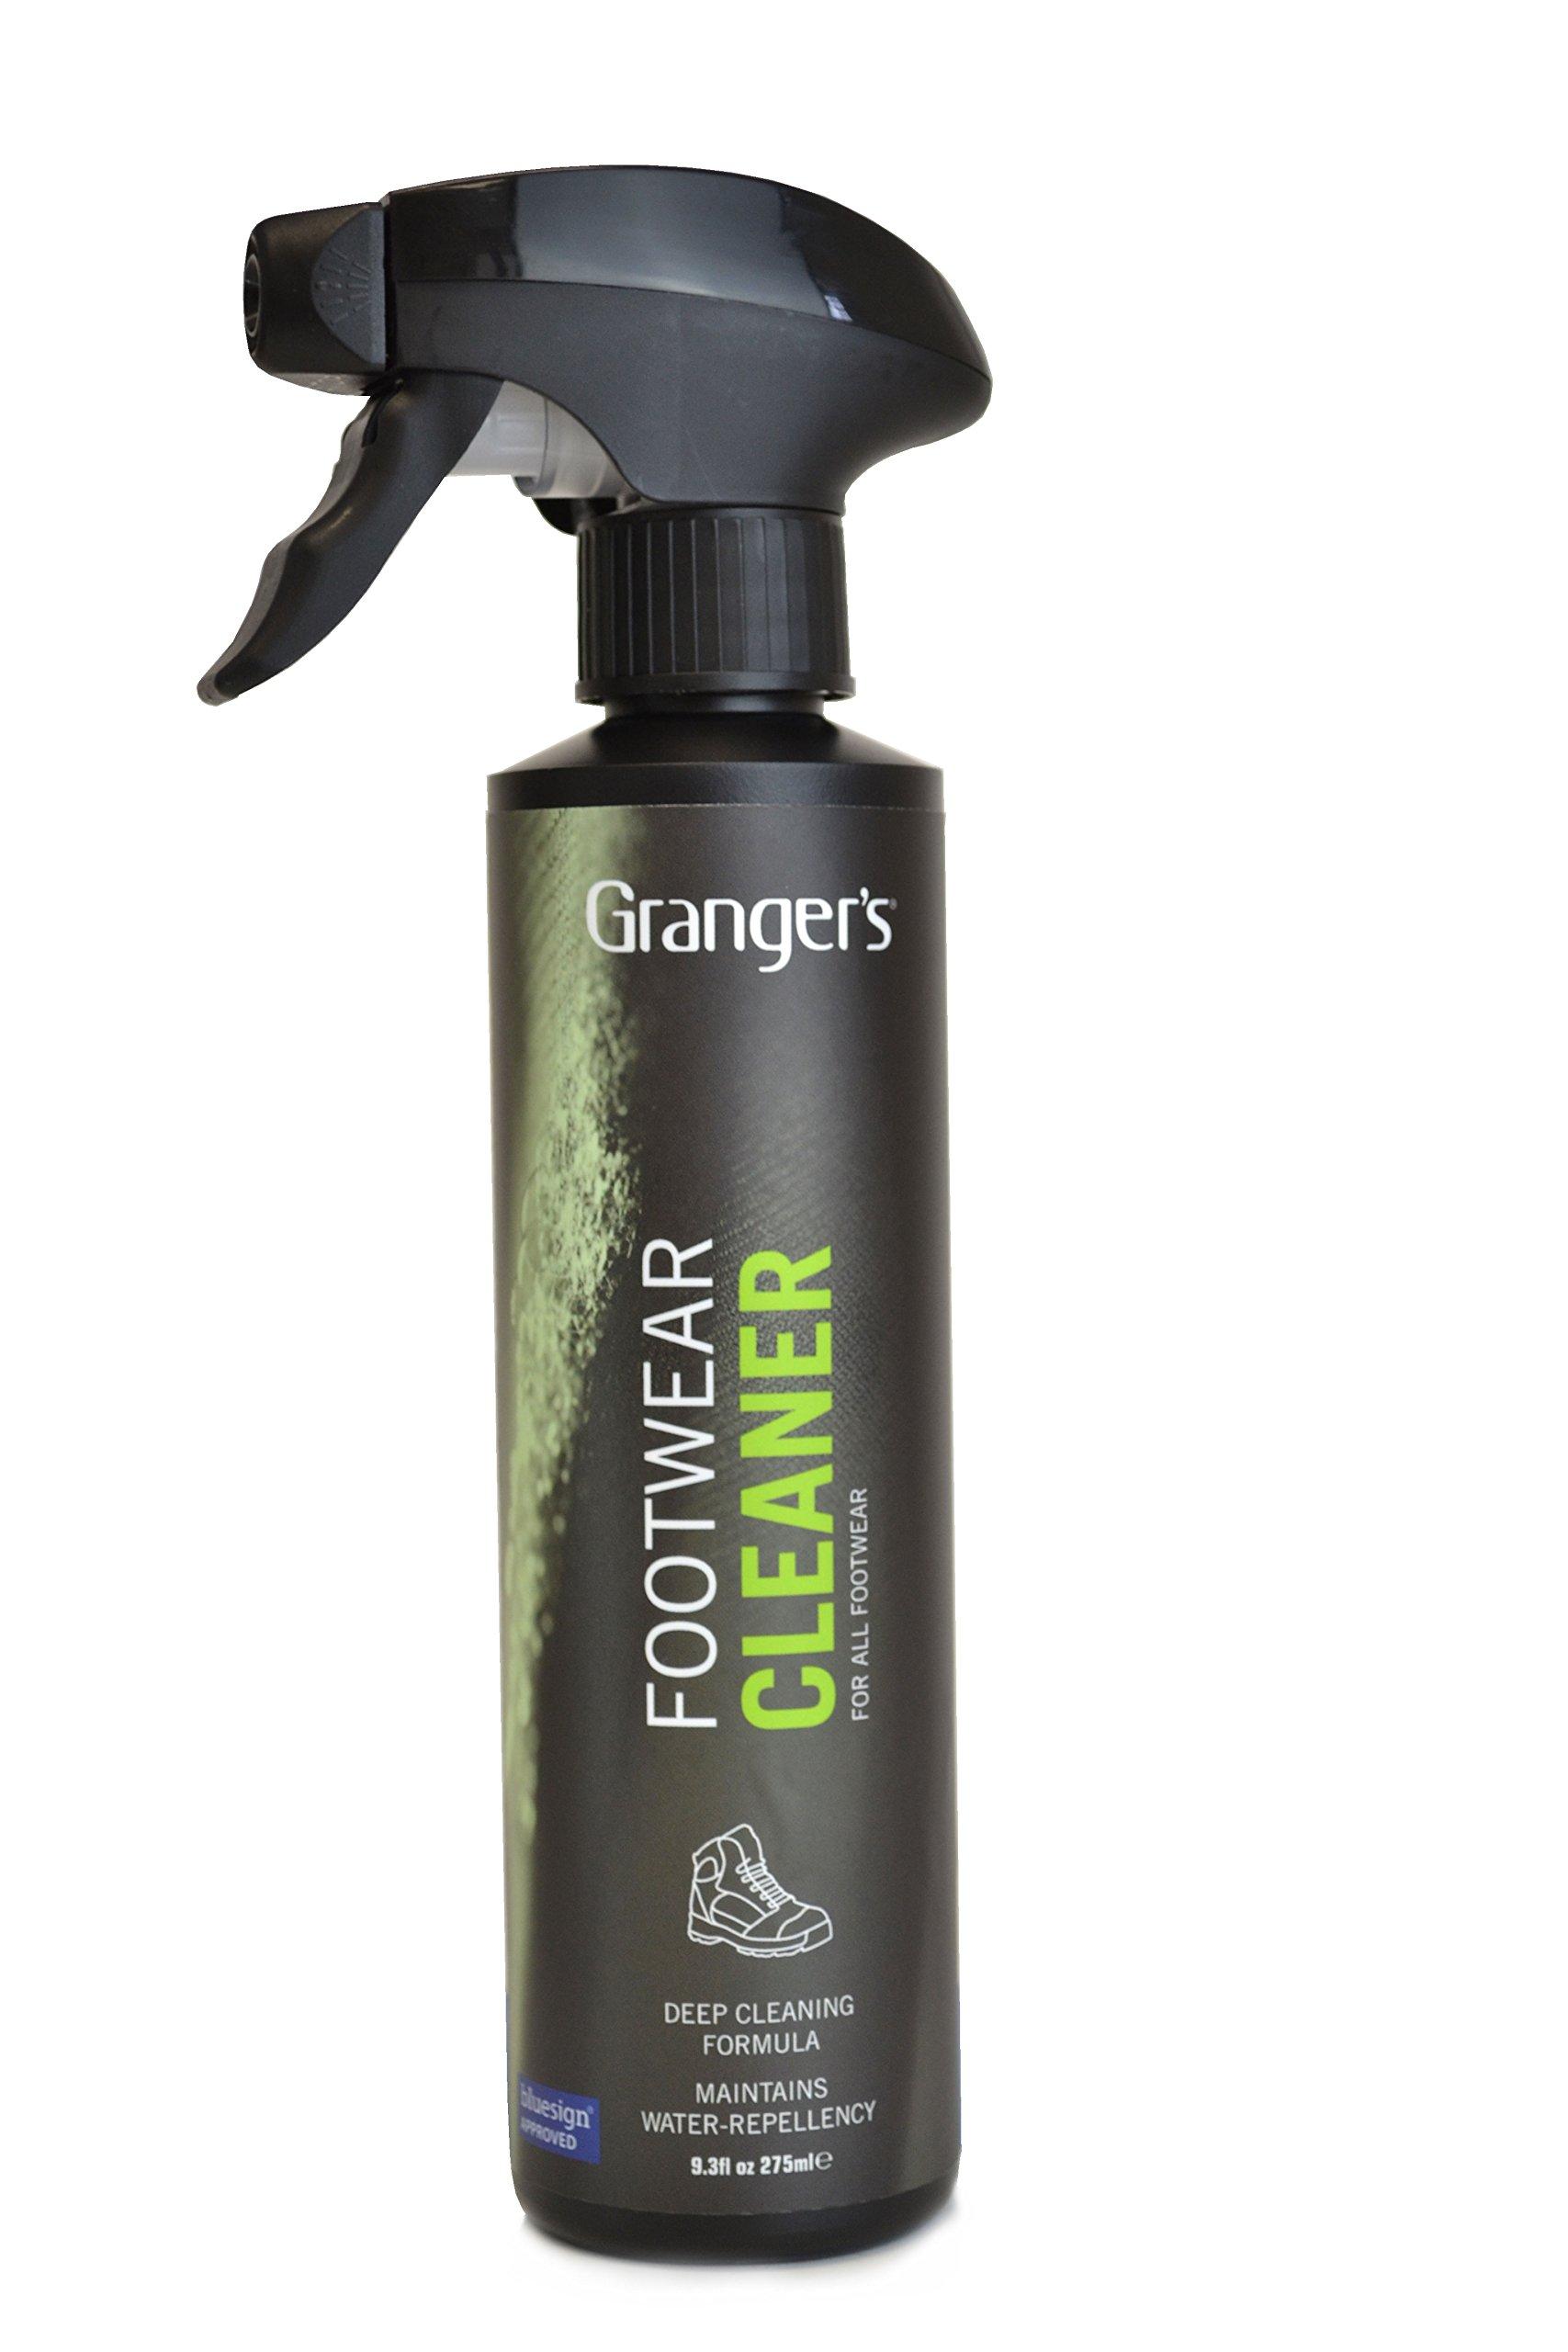 Granger's Footwear Cleaner Spray / 9.3 oz / Made in England